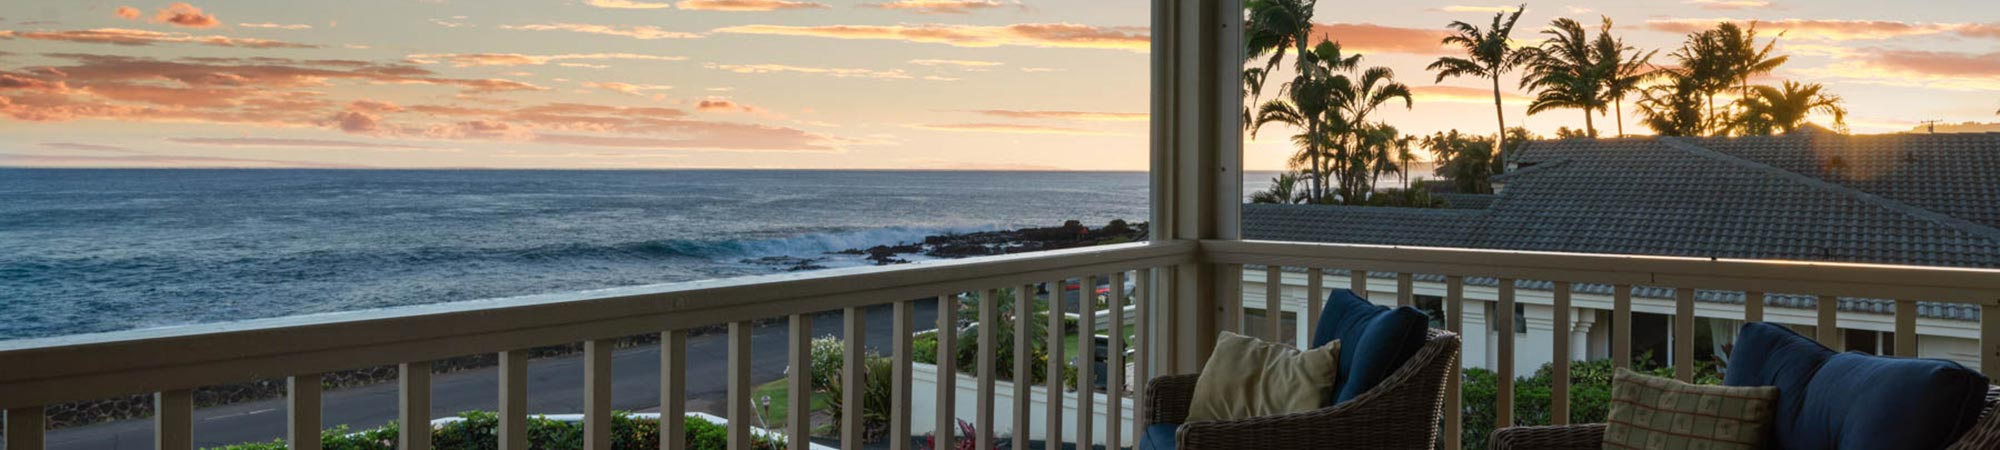 sunset over ocean from Alihi Lani luxury vacation rental, Poipu Beach, Kauai